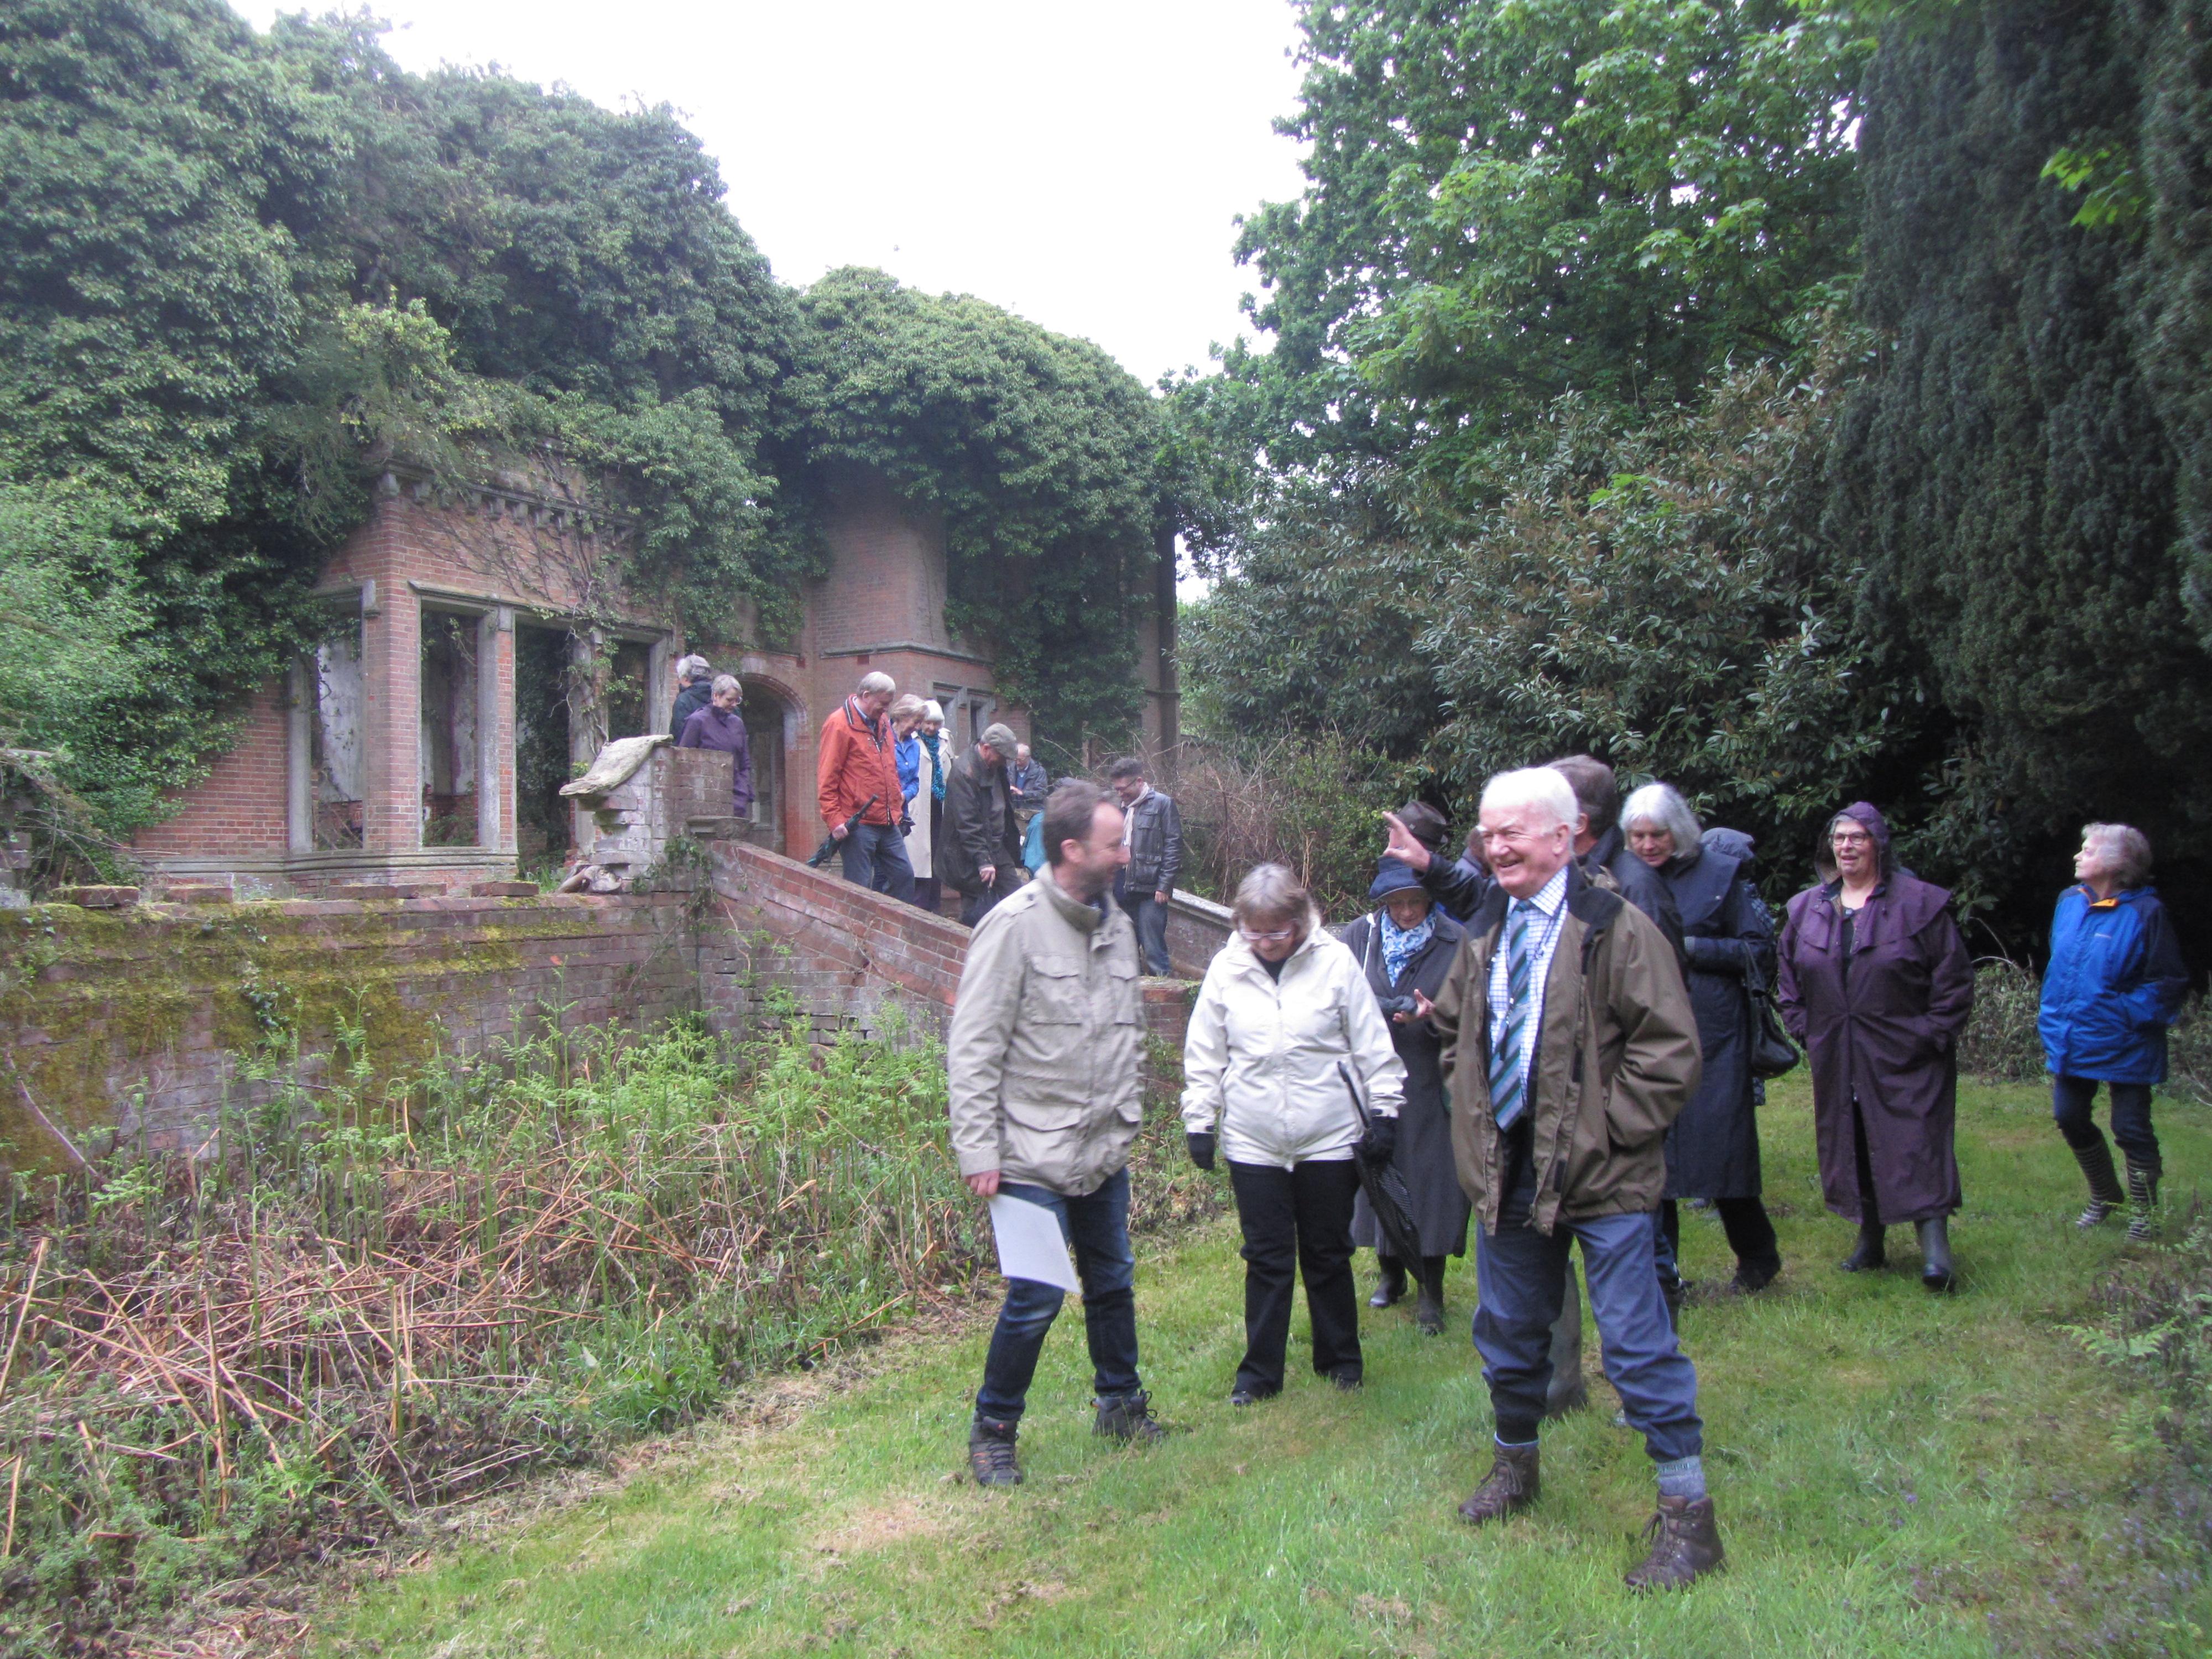 Lavenham society may 2016 visit to Rougham hall